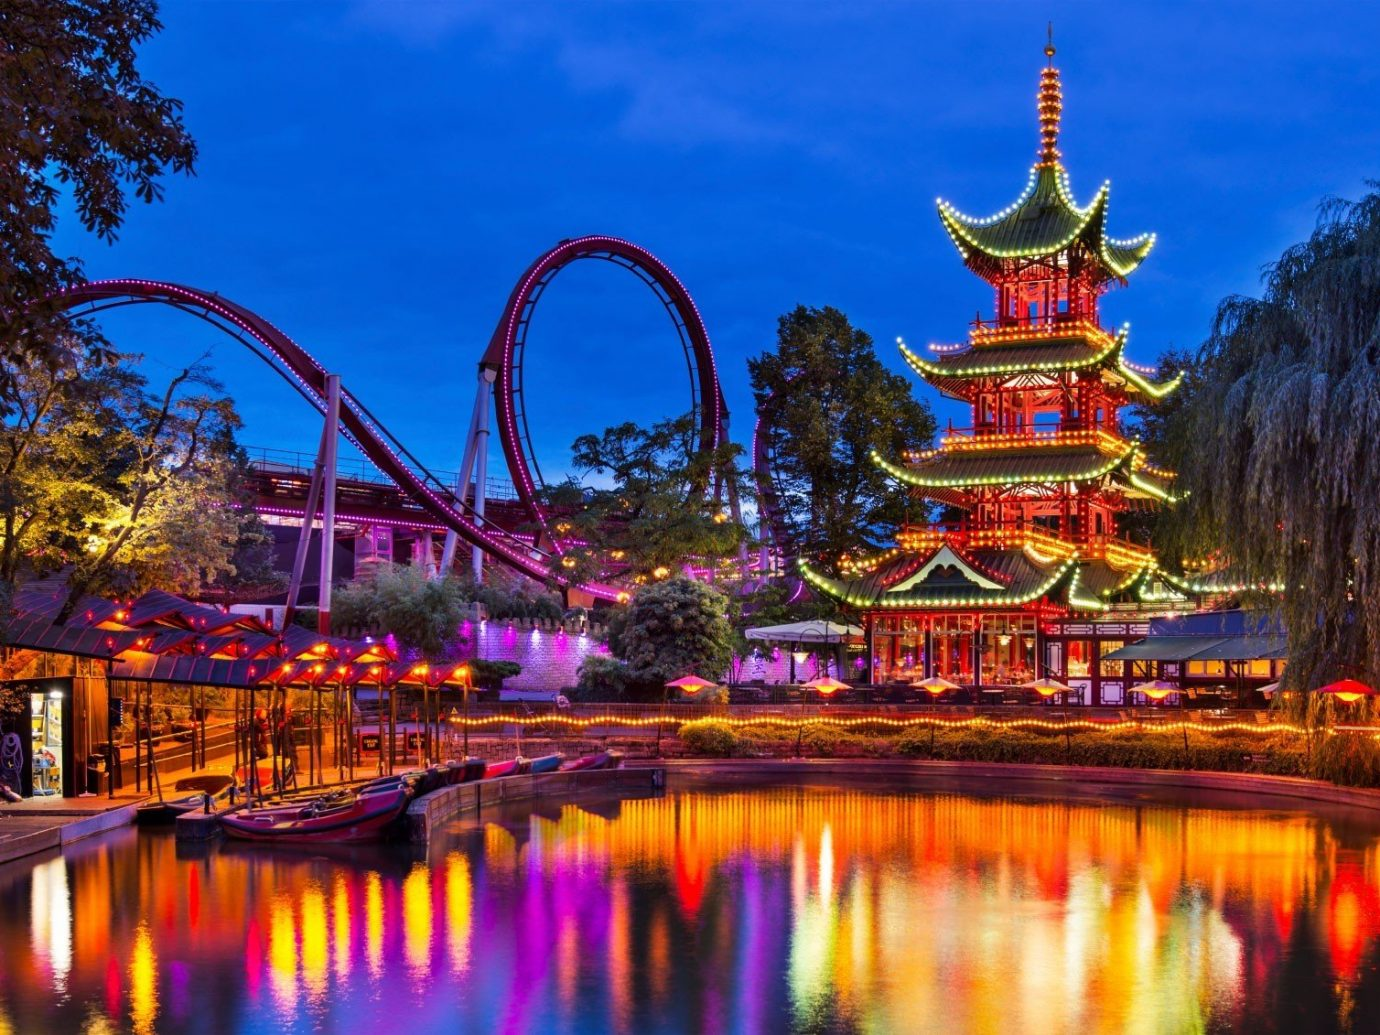 Offbeat tree water outdoor sky landmark River amusement park night reflection park evening cityscape Resort temple colorful